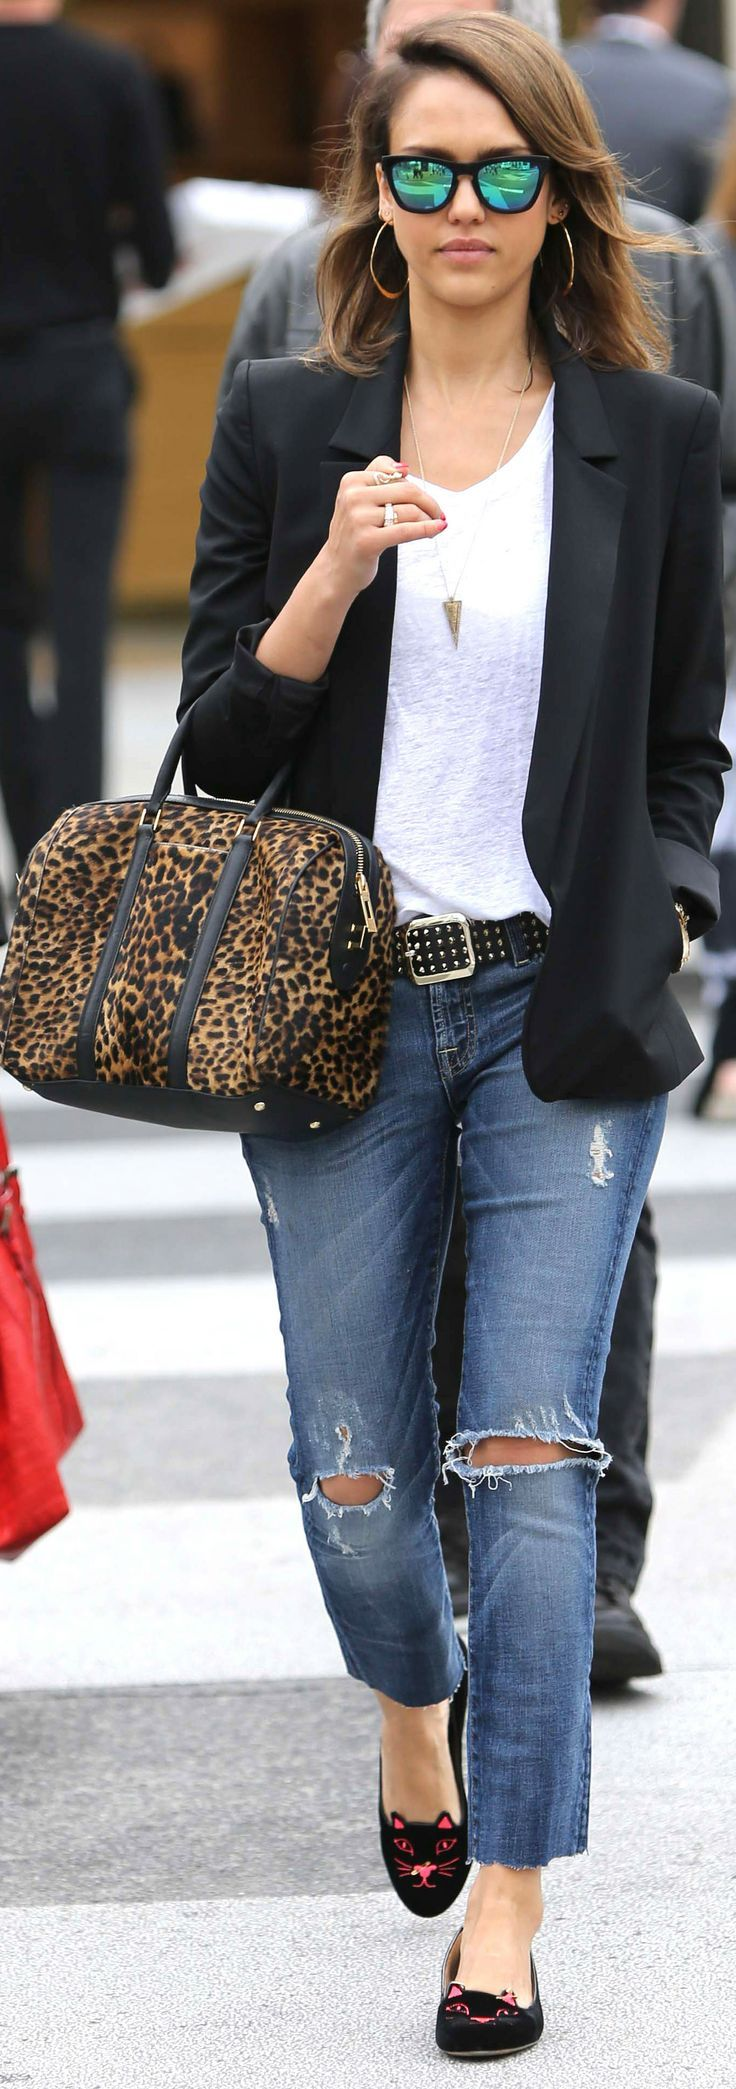 Jessica Alba mixes greats: boyfriend jeans, mirrored sunglasses, Charlotte Olympia flats, and a leopard print bag: